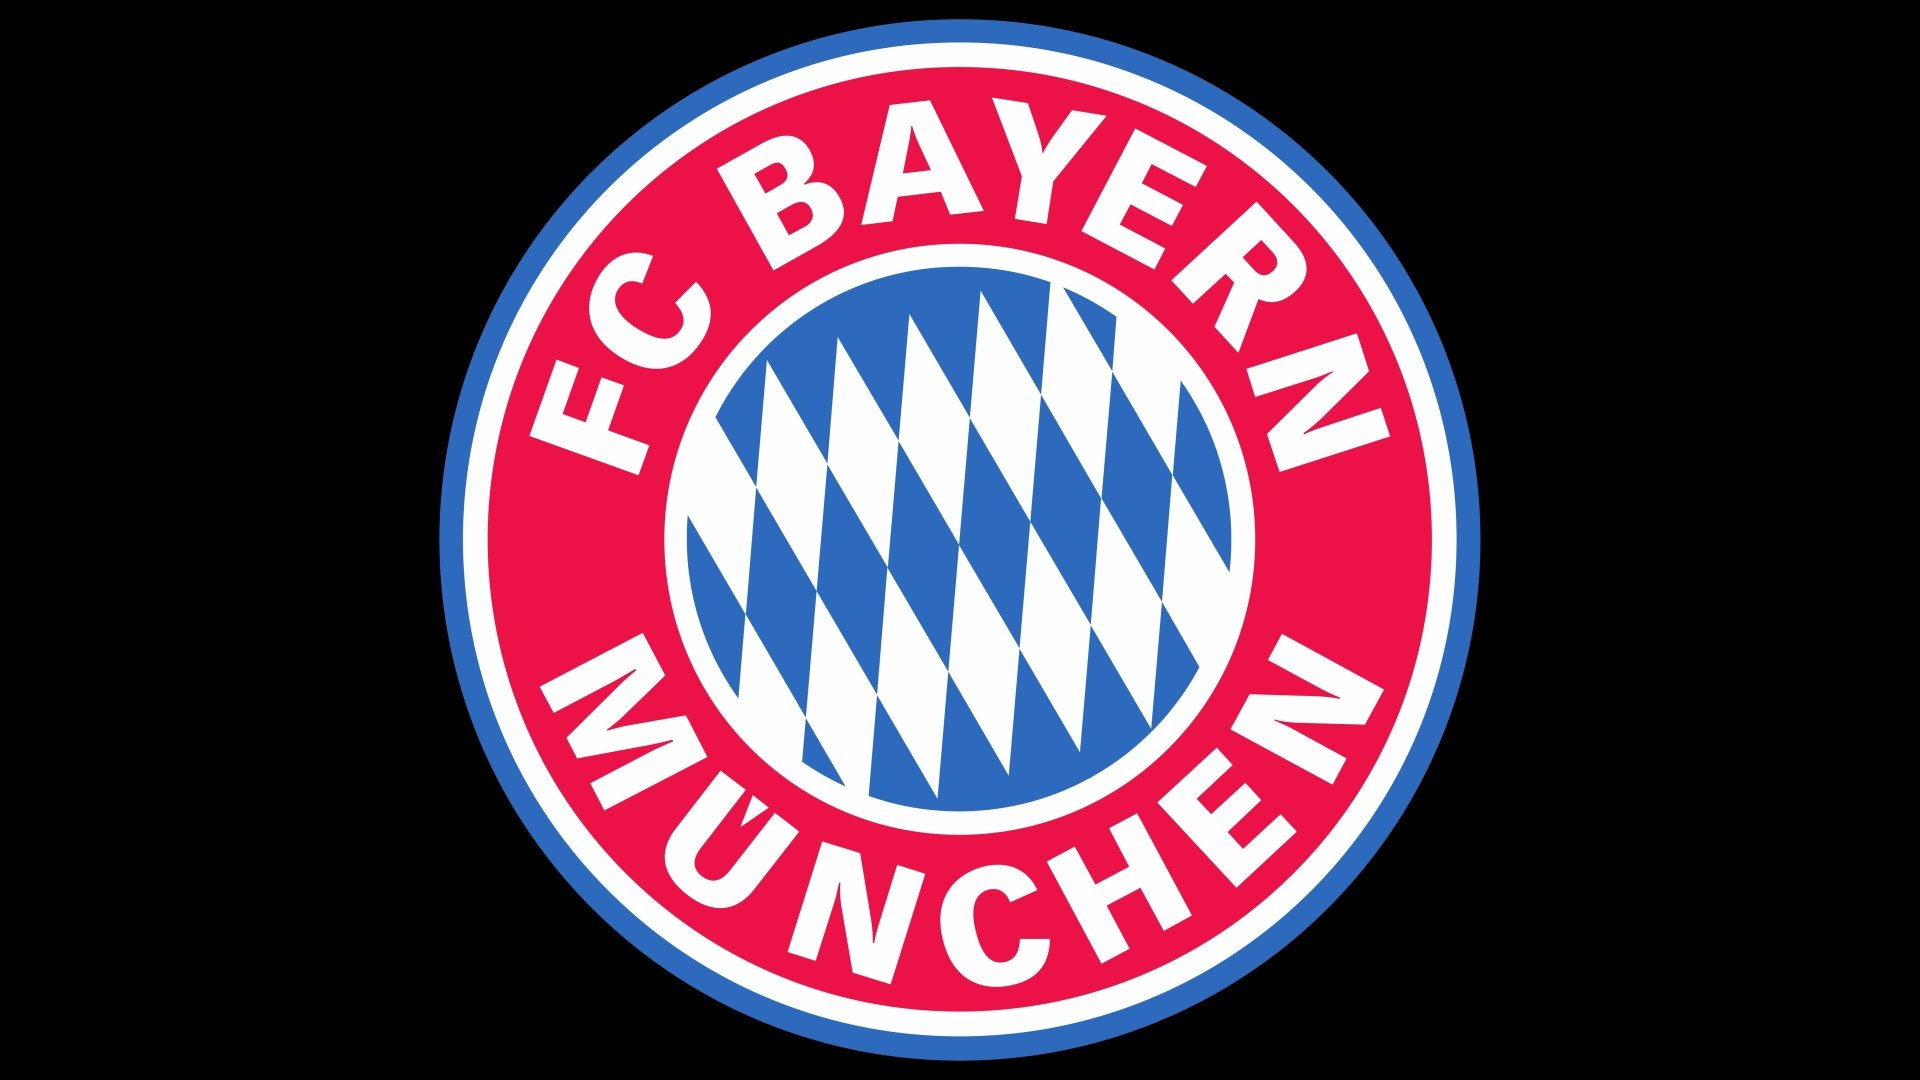 10 4k Ultra Hd Fc Bayern Munich Wallpapers Background Images